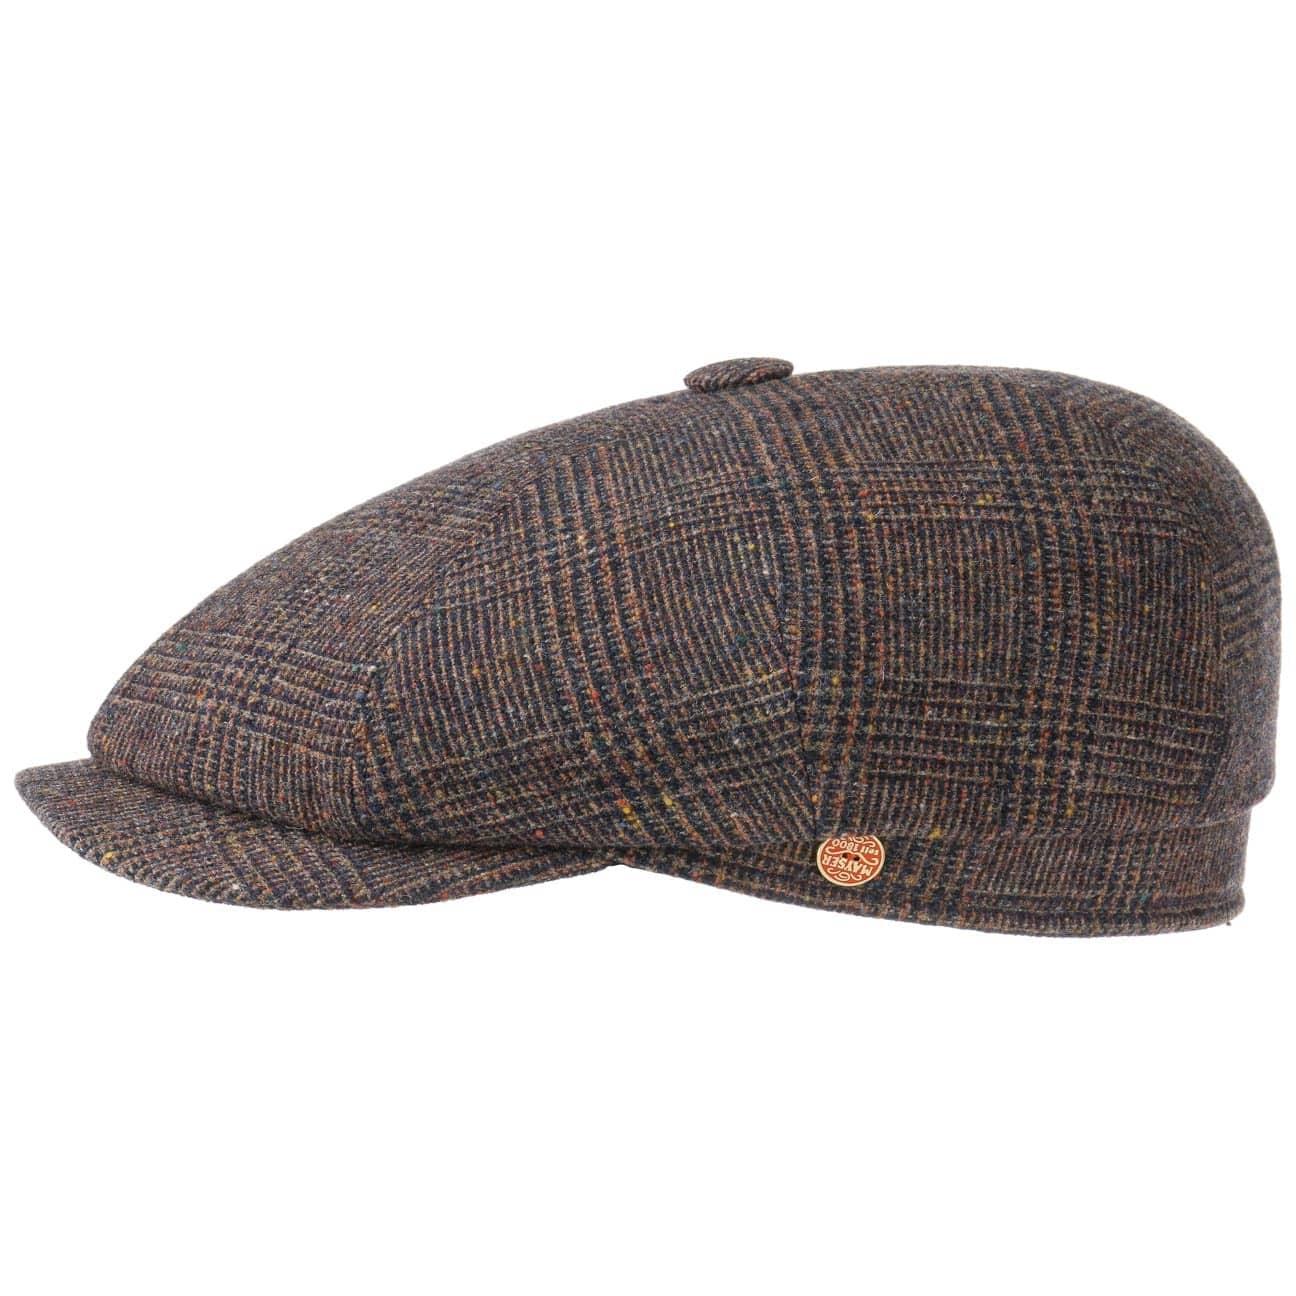 seven-wool-schirmmutze-by-mayser-wintercap, 89.95 EUR @ hutshopping-de